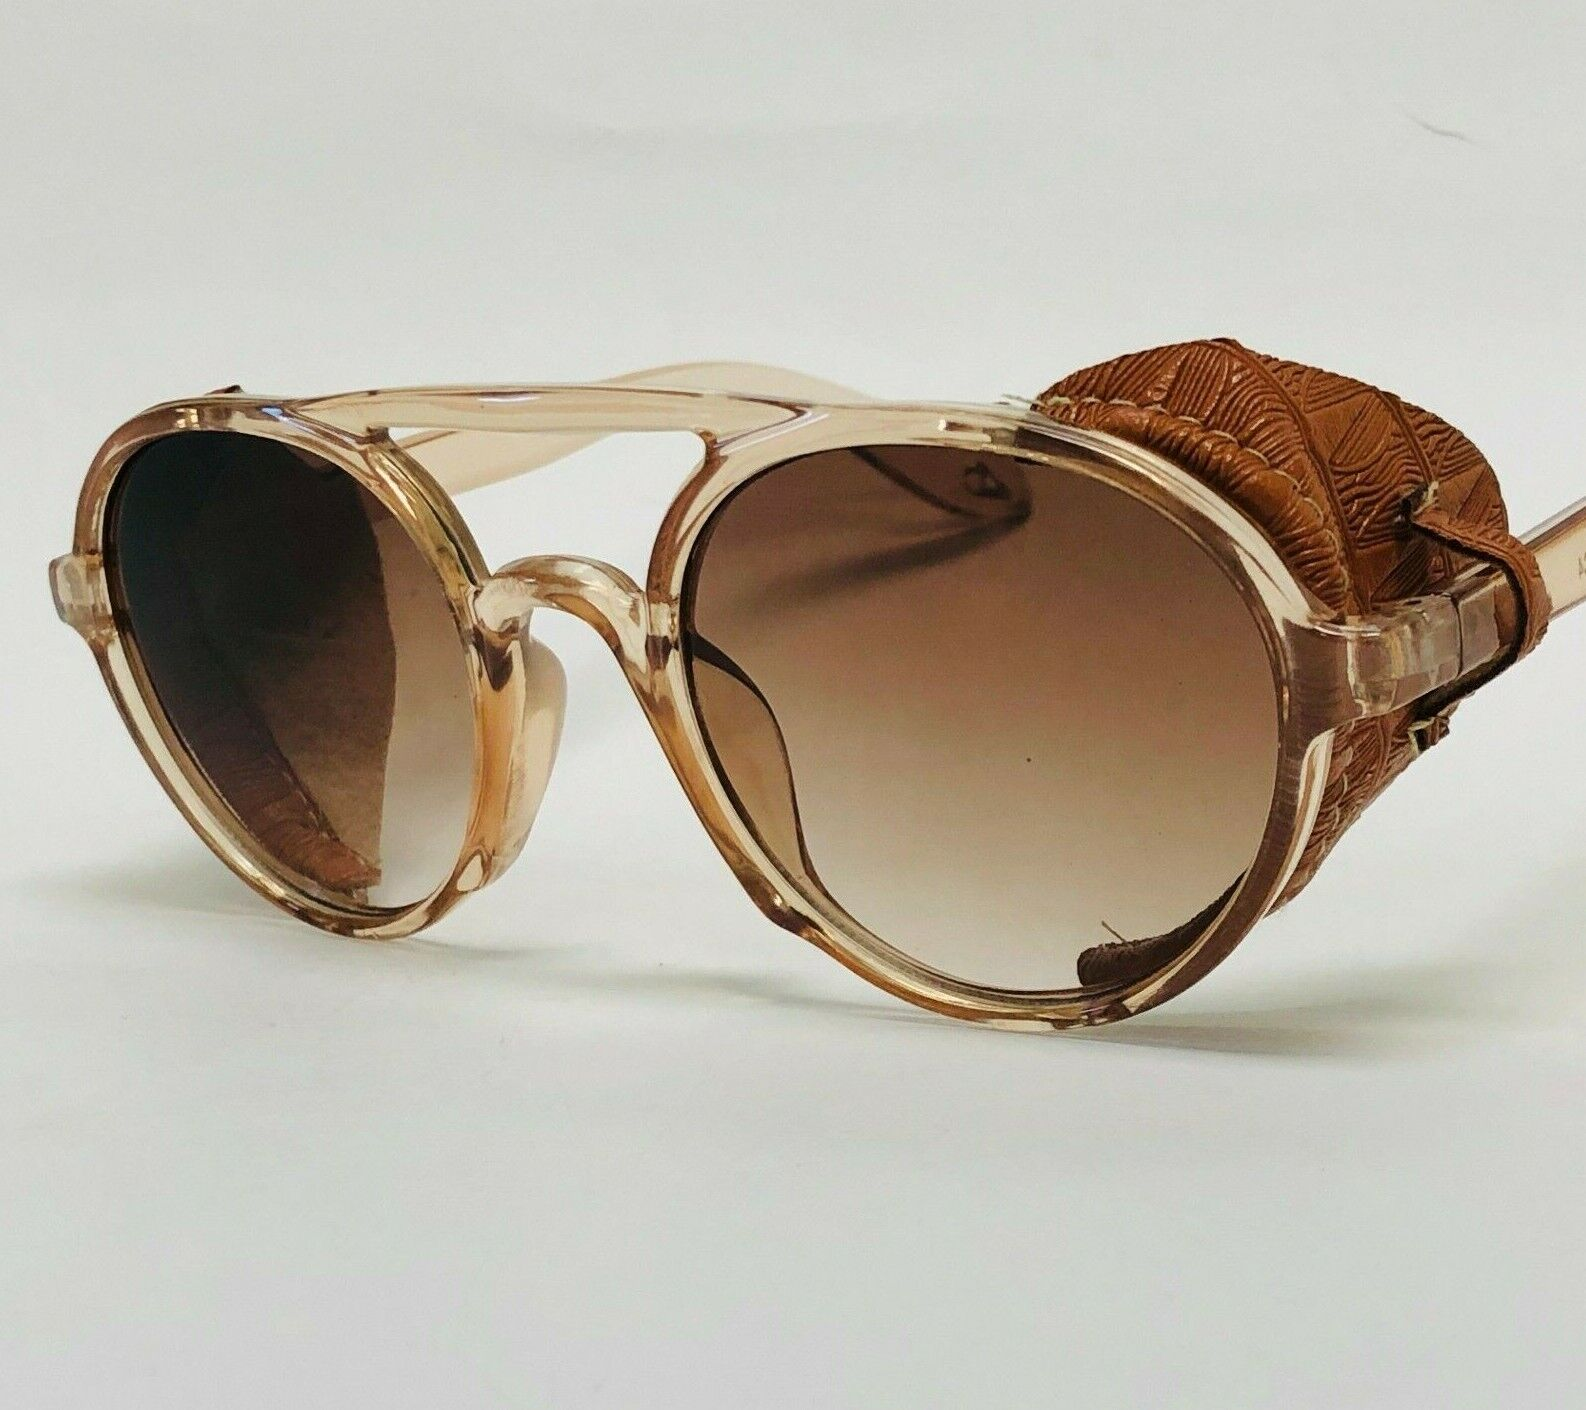 Mens Women Sunglasses Vintage Steampunk Side Shields Leather Round Retro Shades